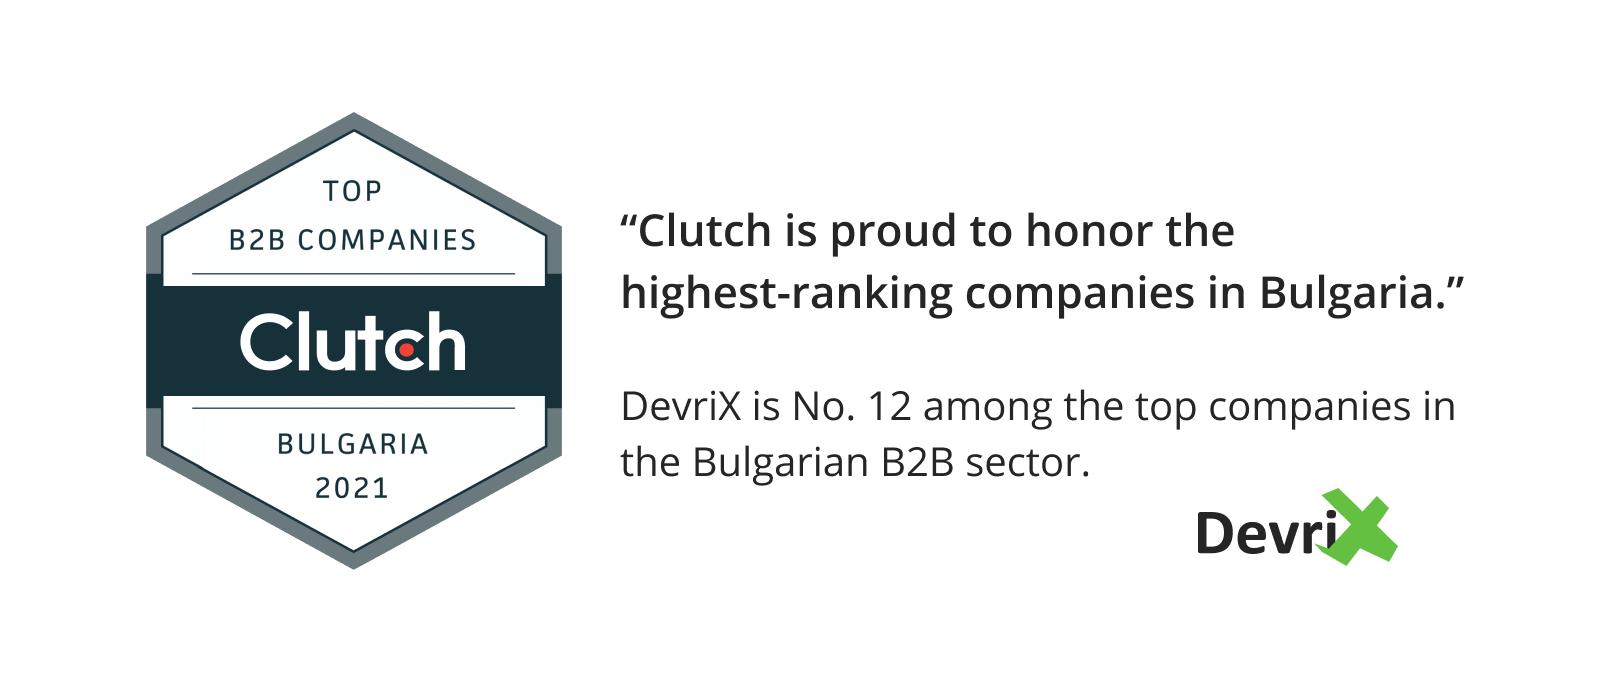 Clutch is proud Top B2B companies in Bulgaria by Clutch